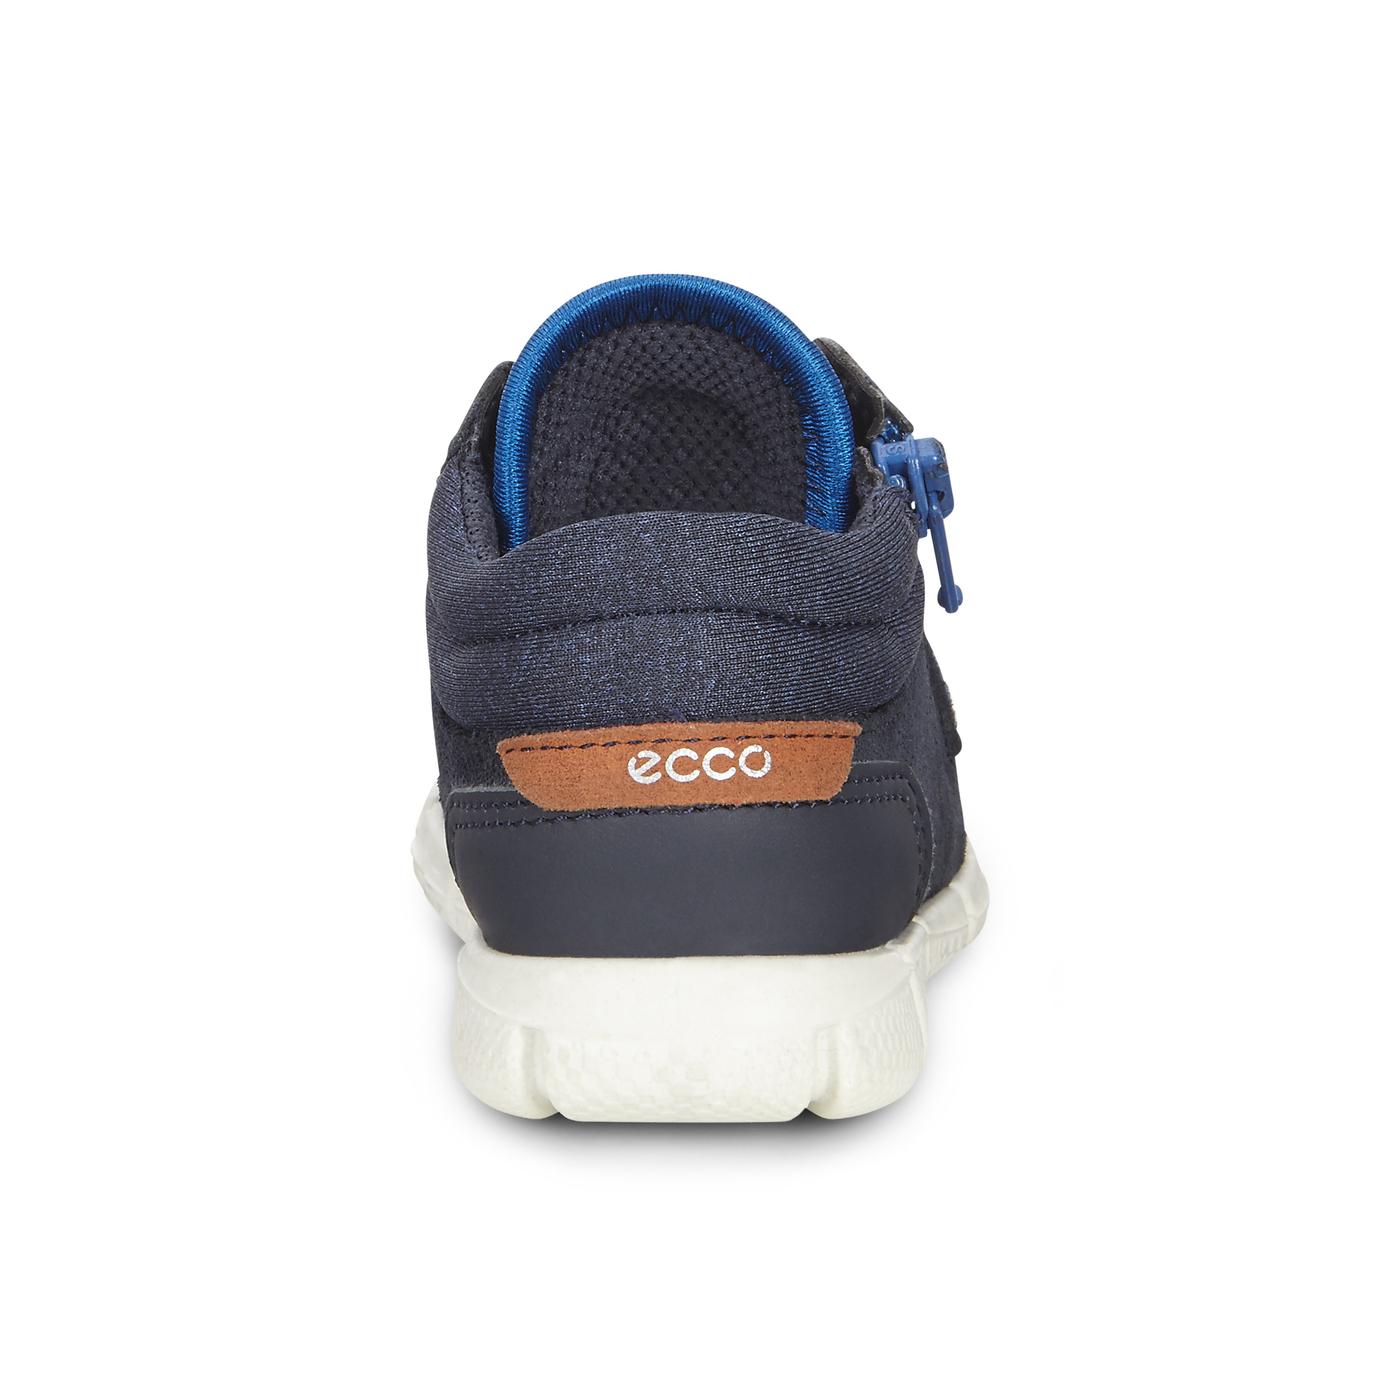 ECCO Intrinsic Mini